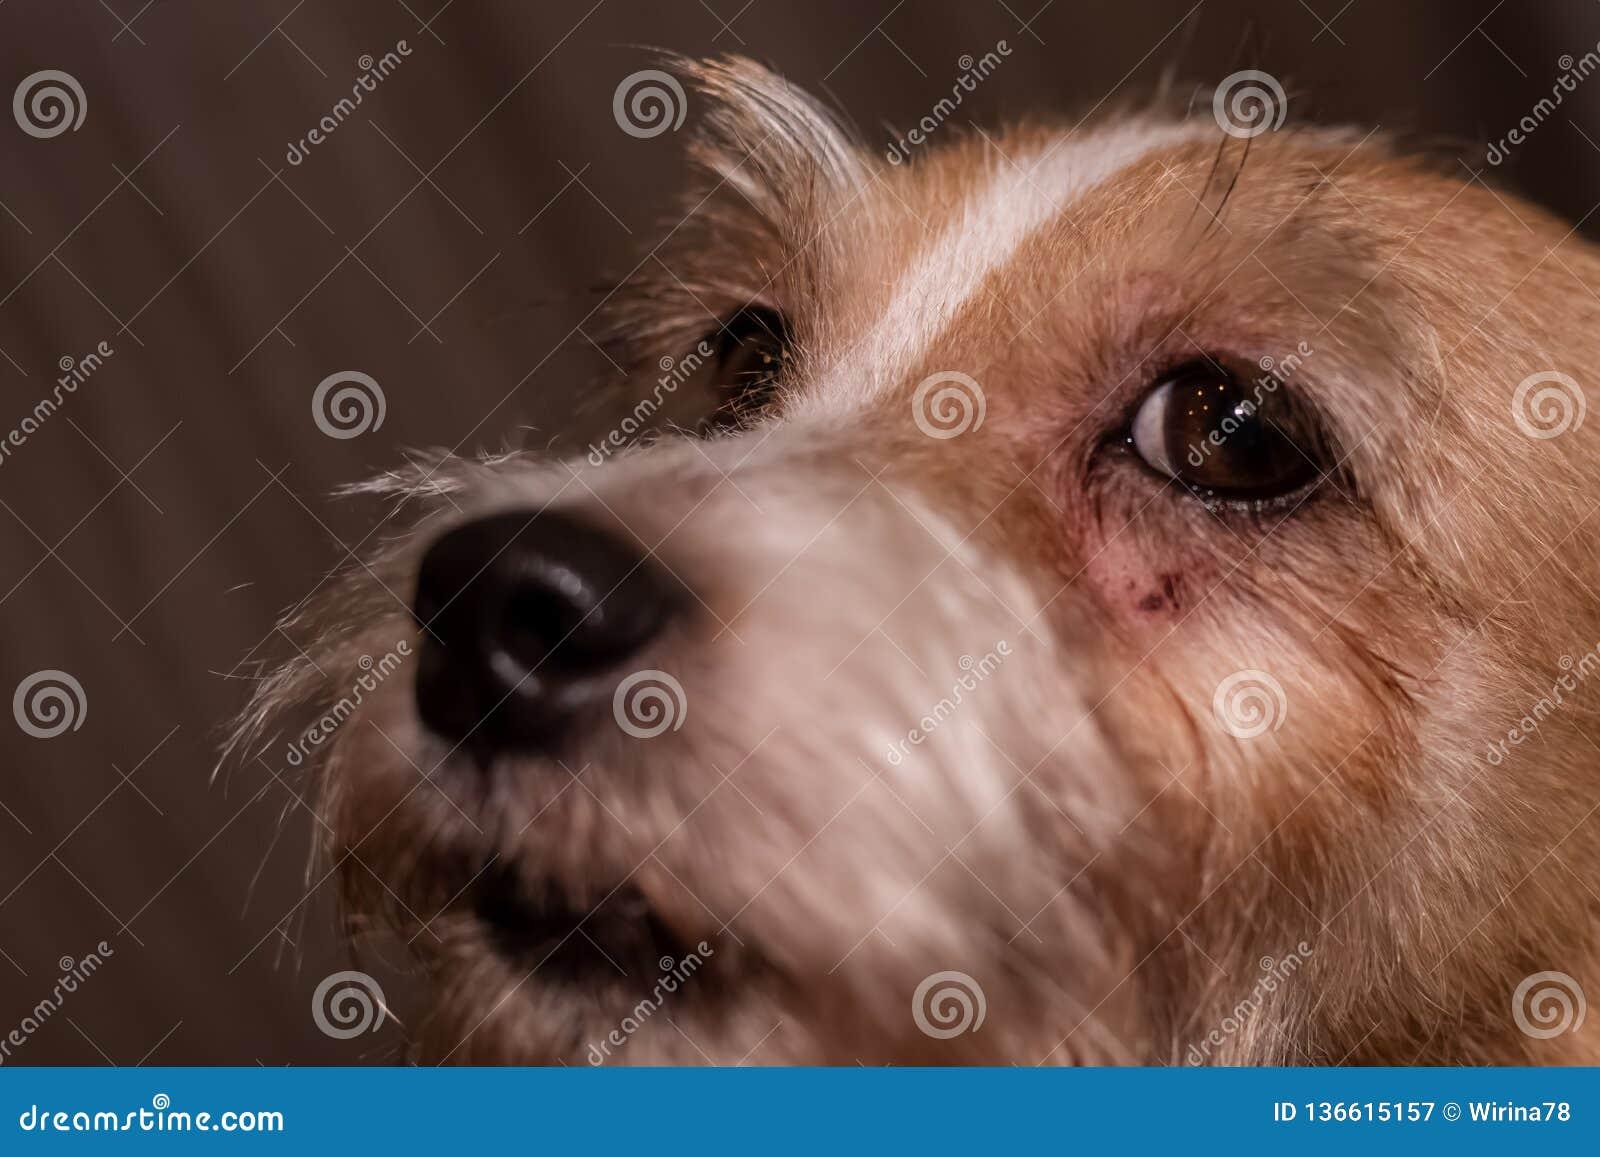 Psiej alergii oczu skóry nad futerka itchy choroba Zbliżenie narysy